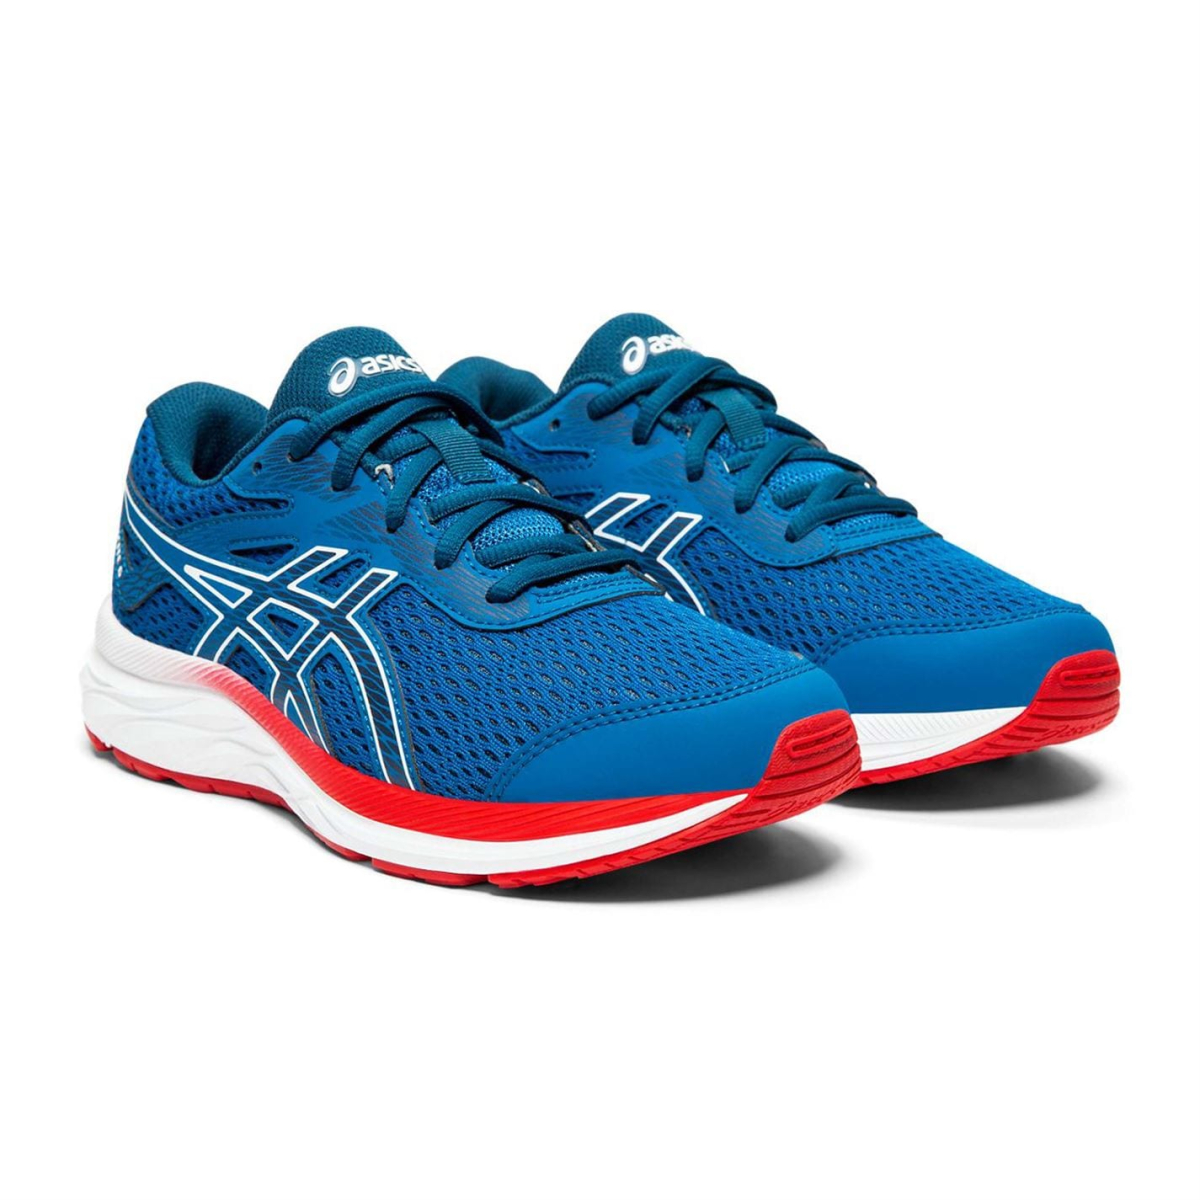 Asics-Gel-Excite-6-Turnschuhe-Laufschuhe-Jungen-Kinder-Sneaker-Sportschuhe-7026 Indexbild 5